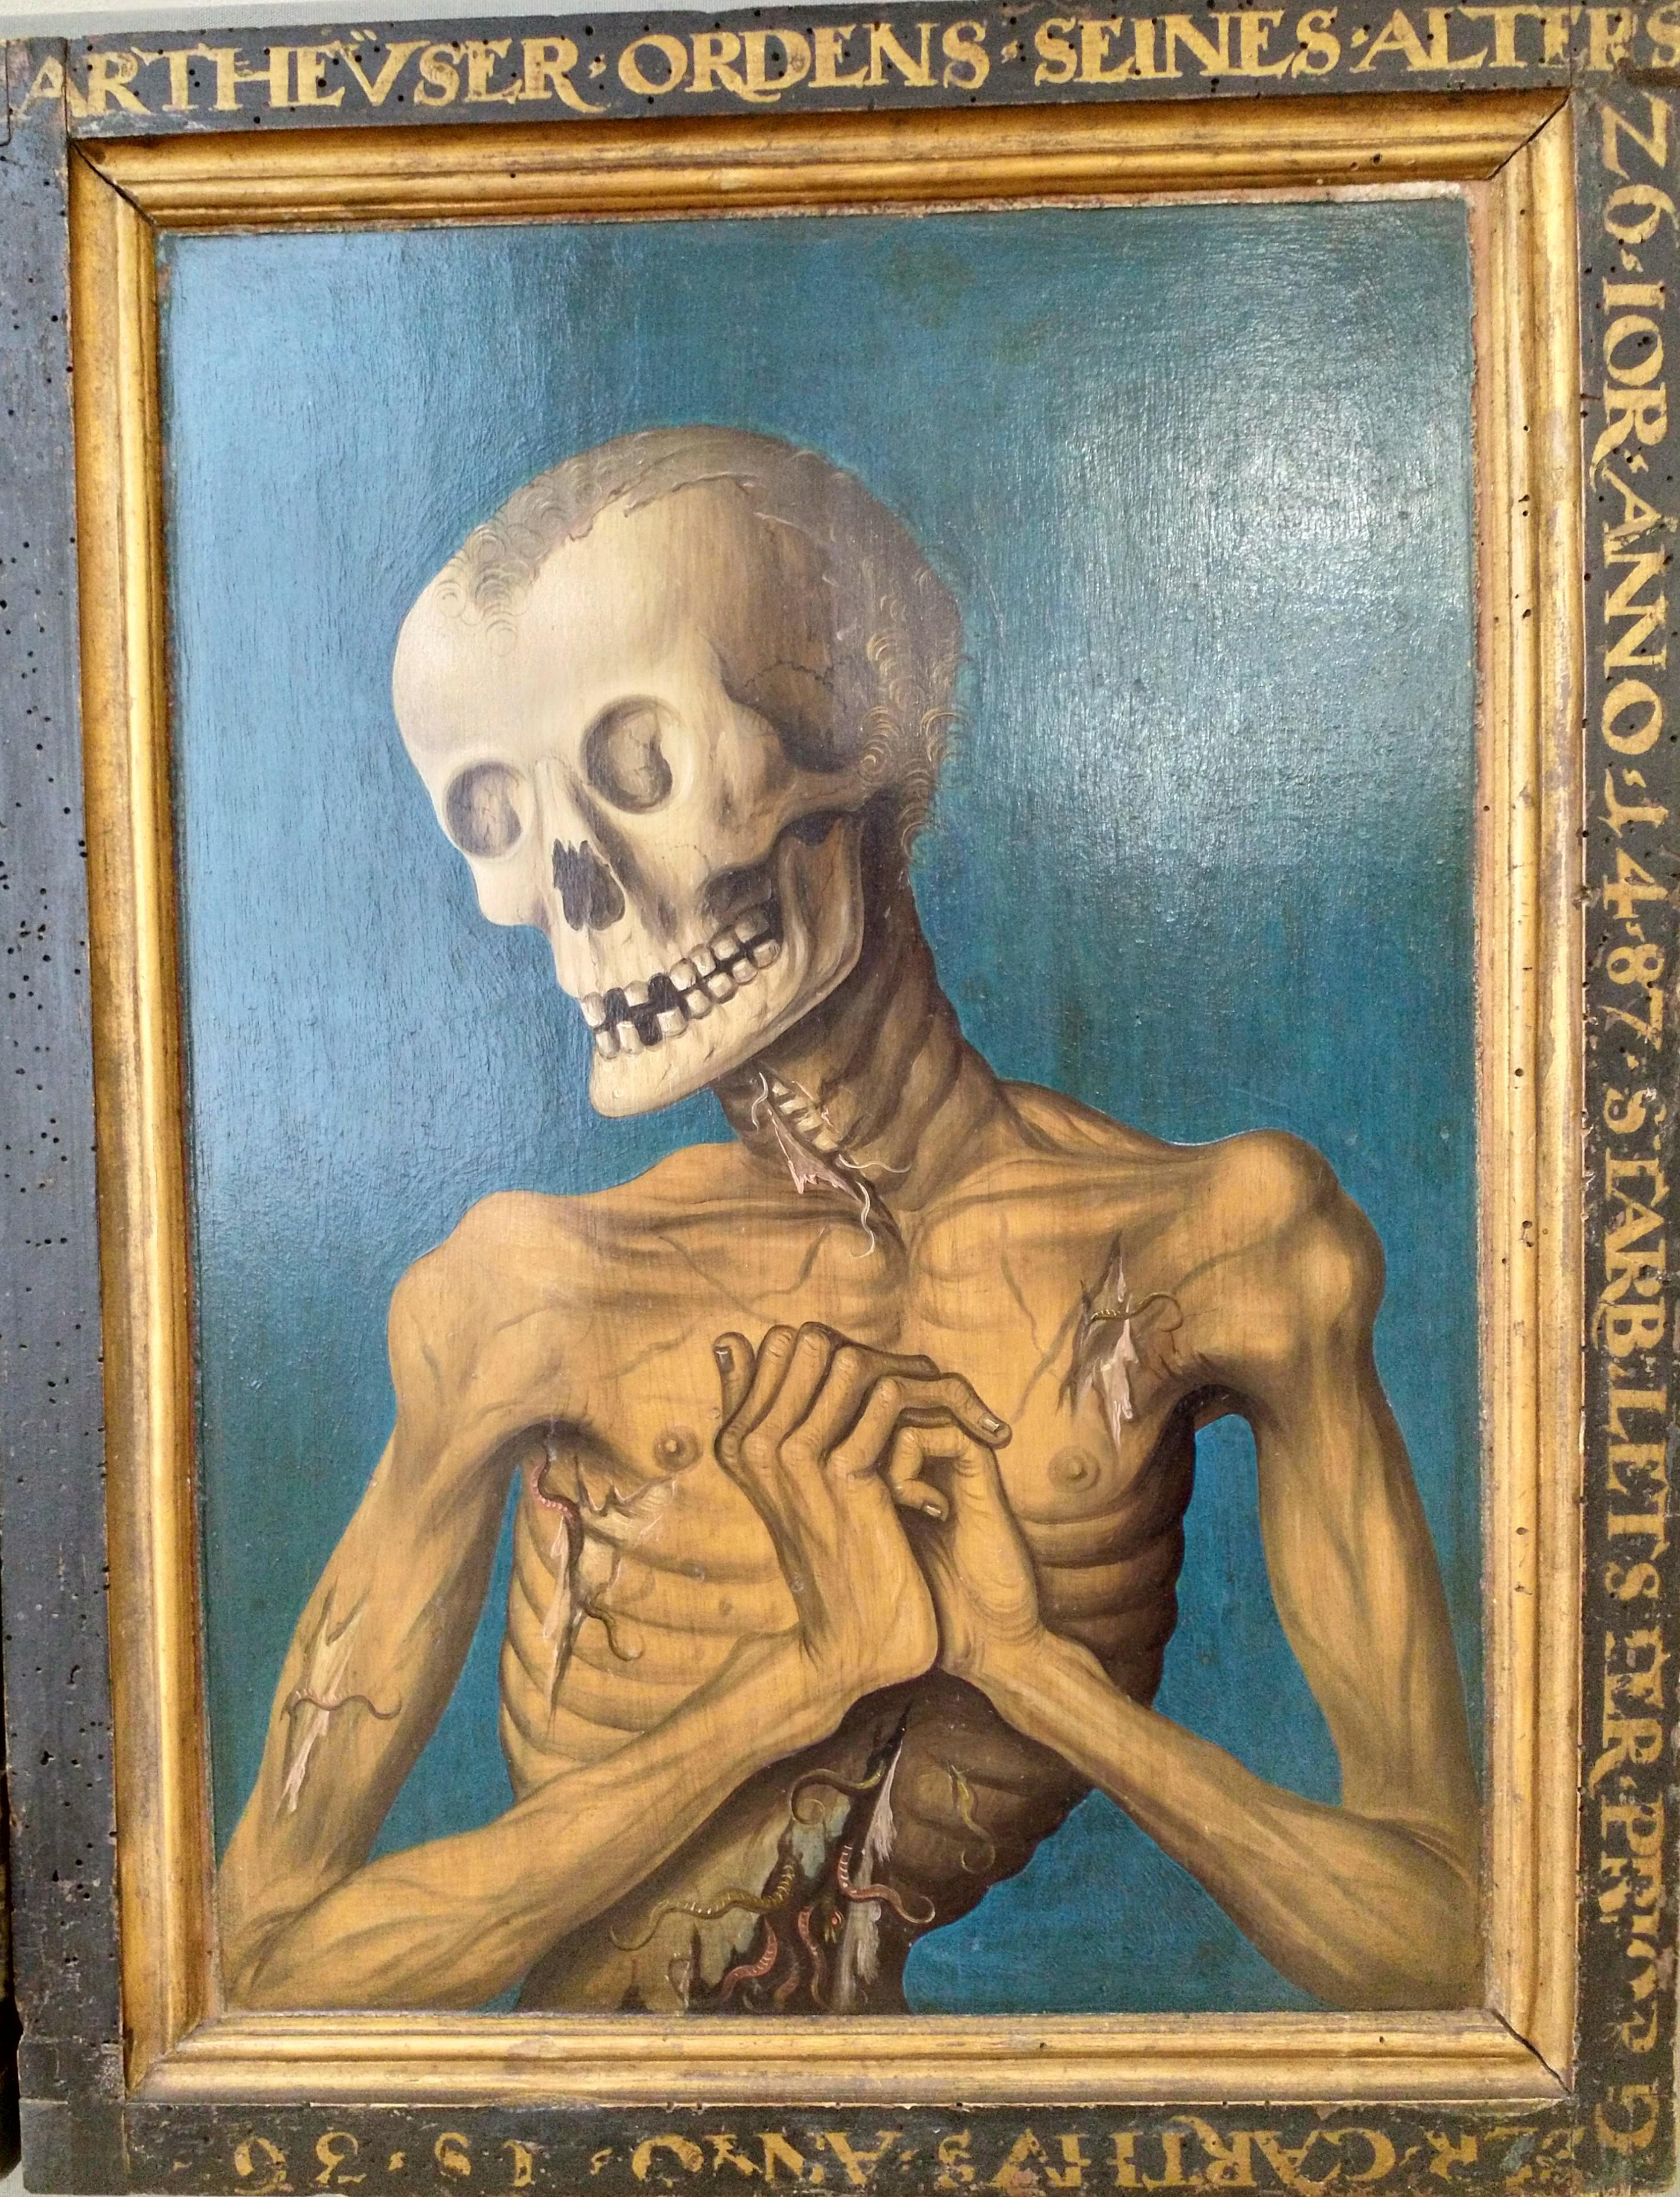 Anonyme 1487 Double portrait macabre de Hieronymus Tschekkenburlin, Bale, Kunstmuseum B